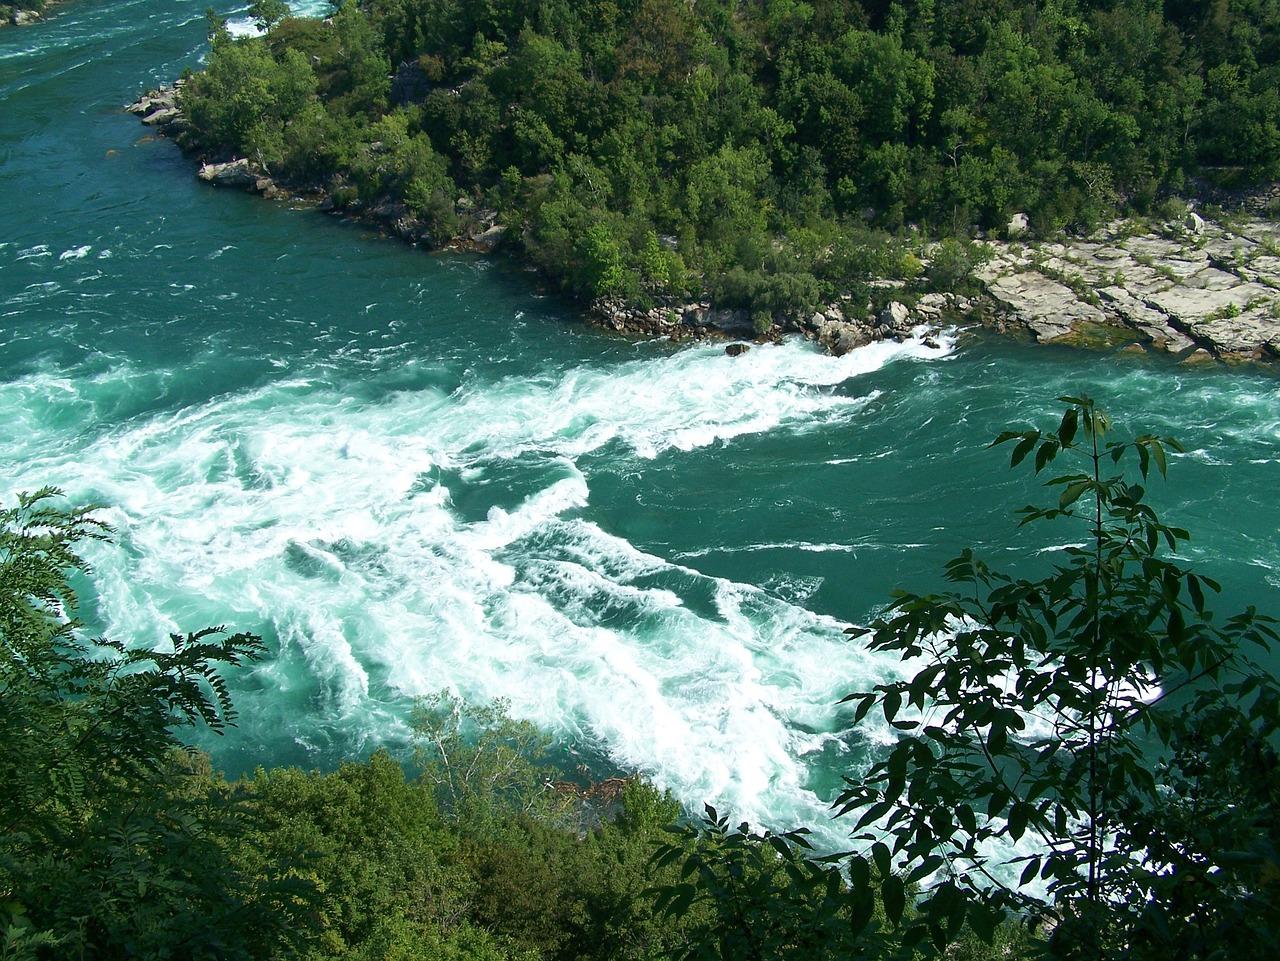 River,rapids,land,landscape,motion - free image from needpix.com